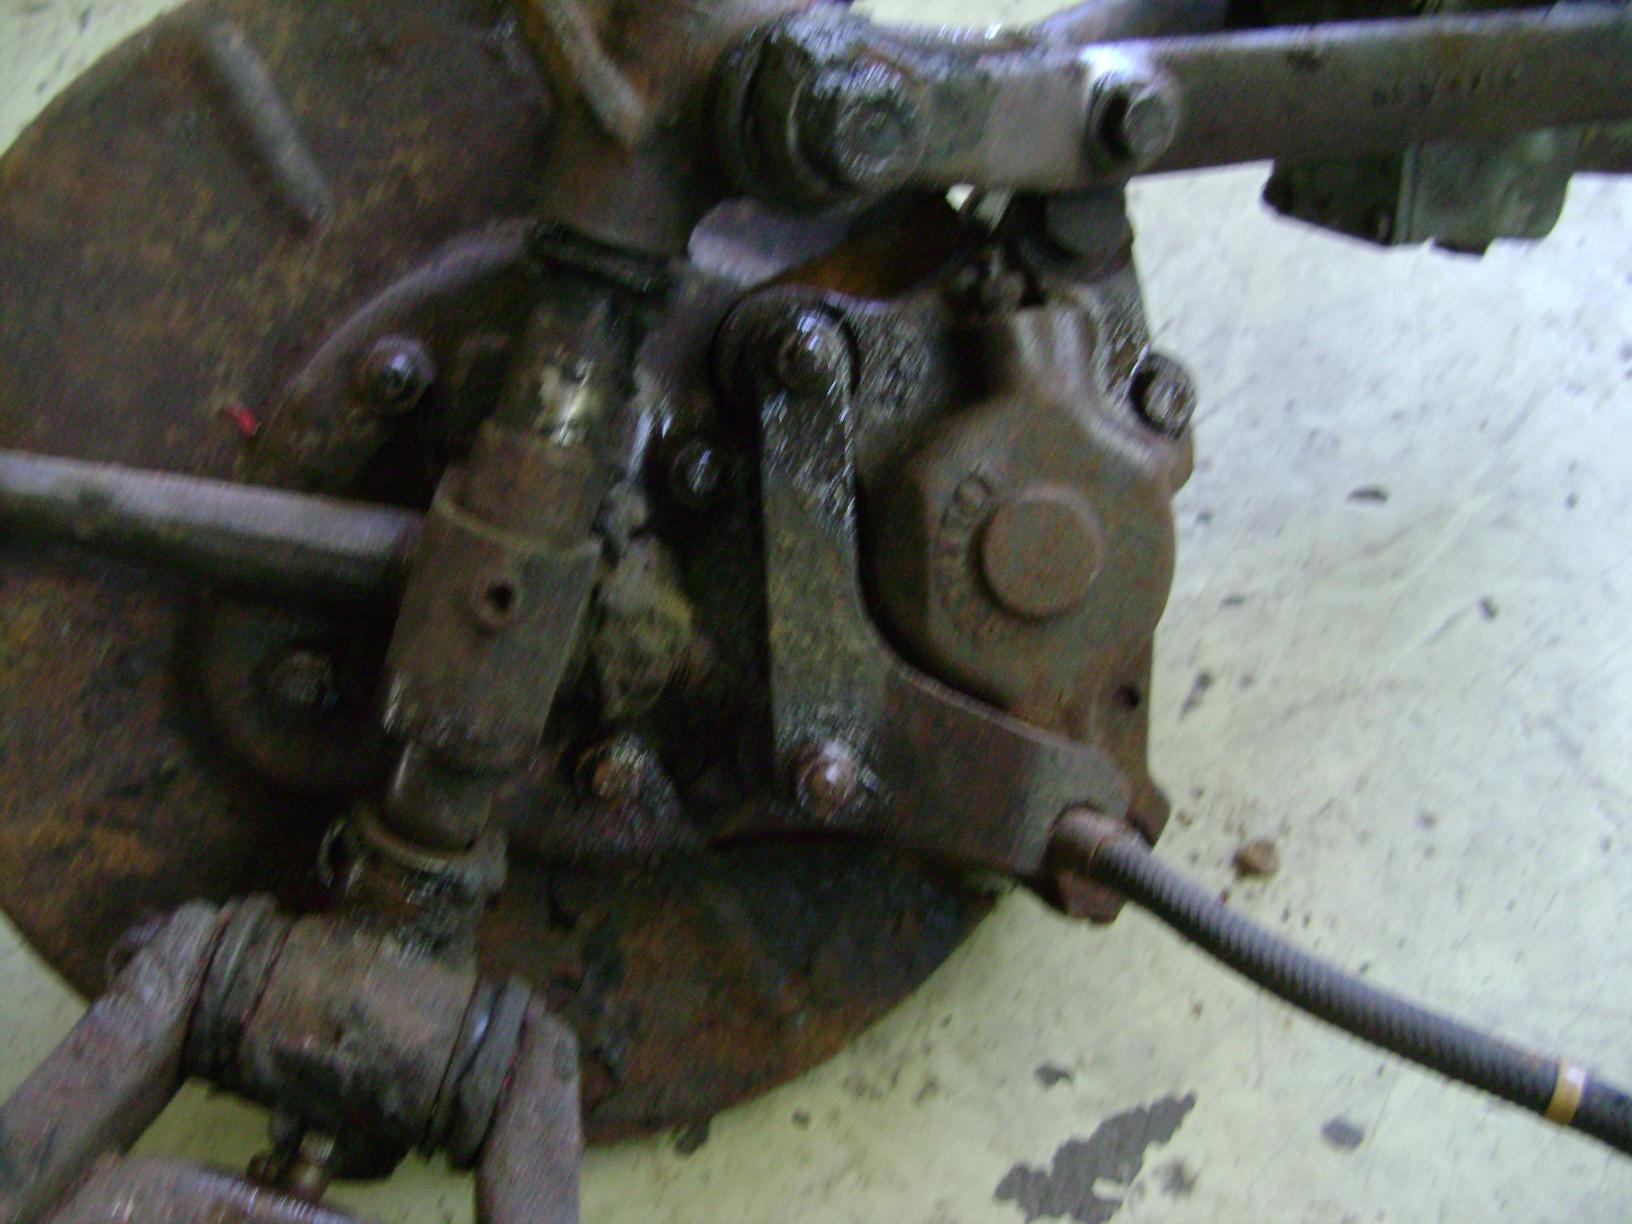 MG A II 084